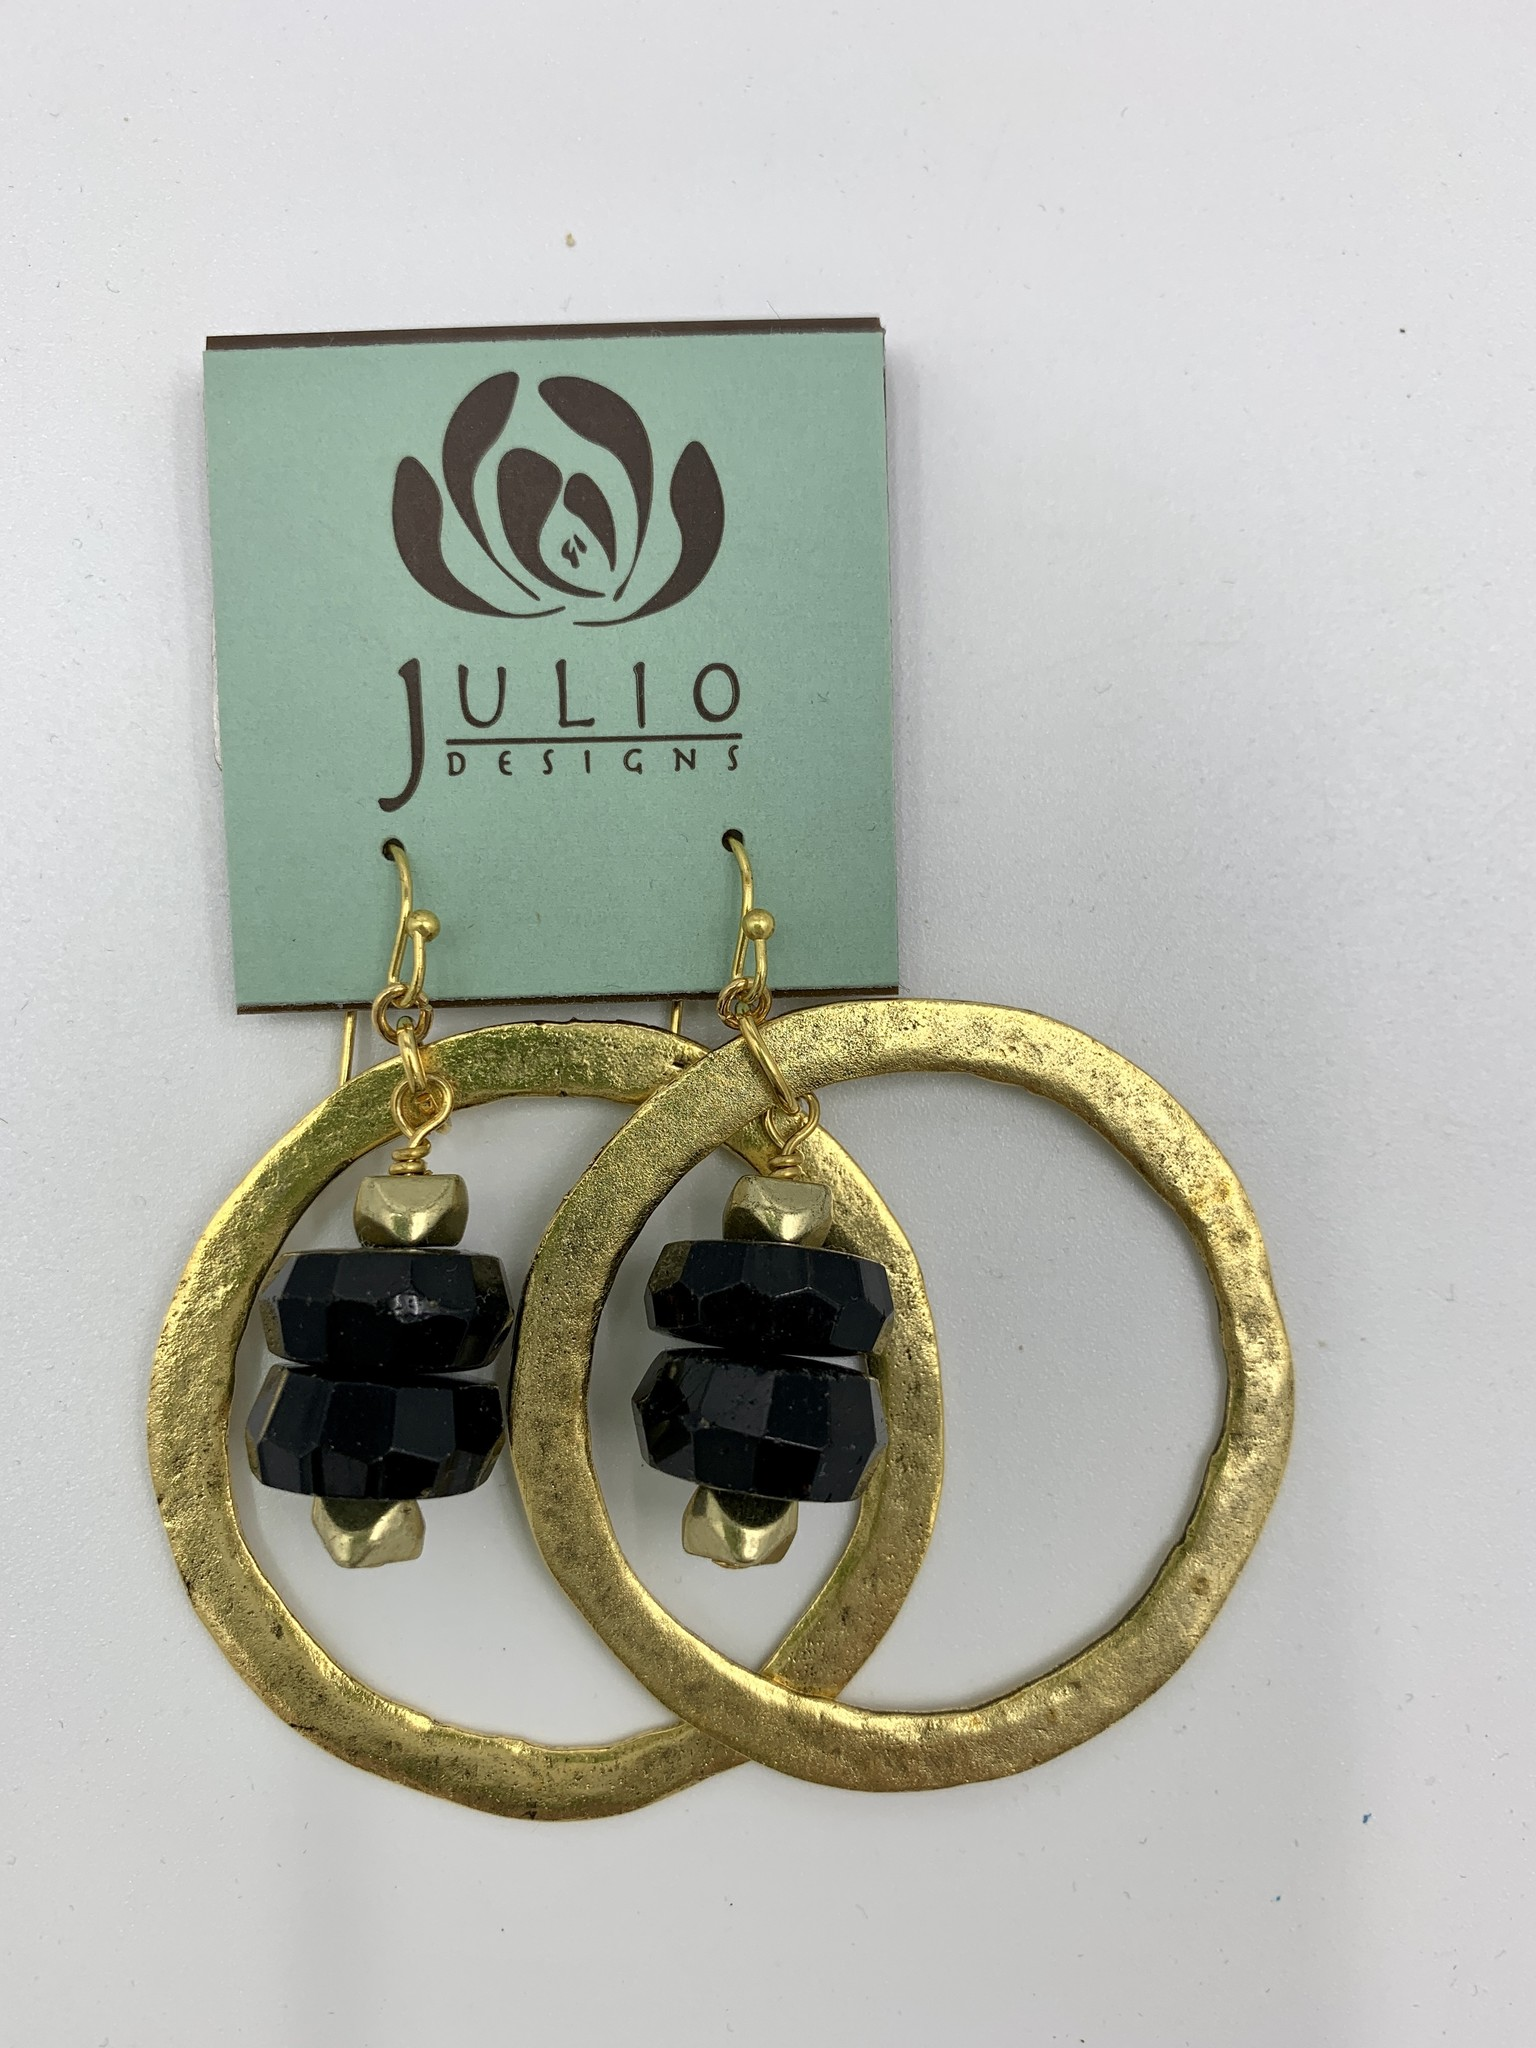 Julio Designs Brass Hoop